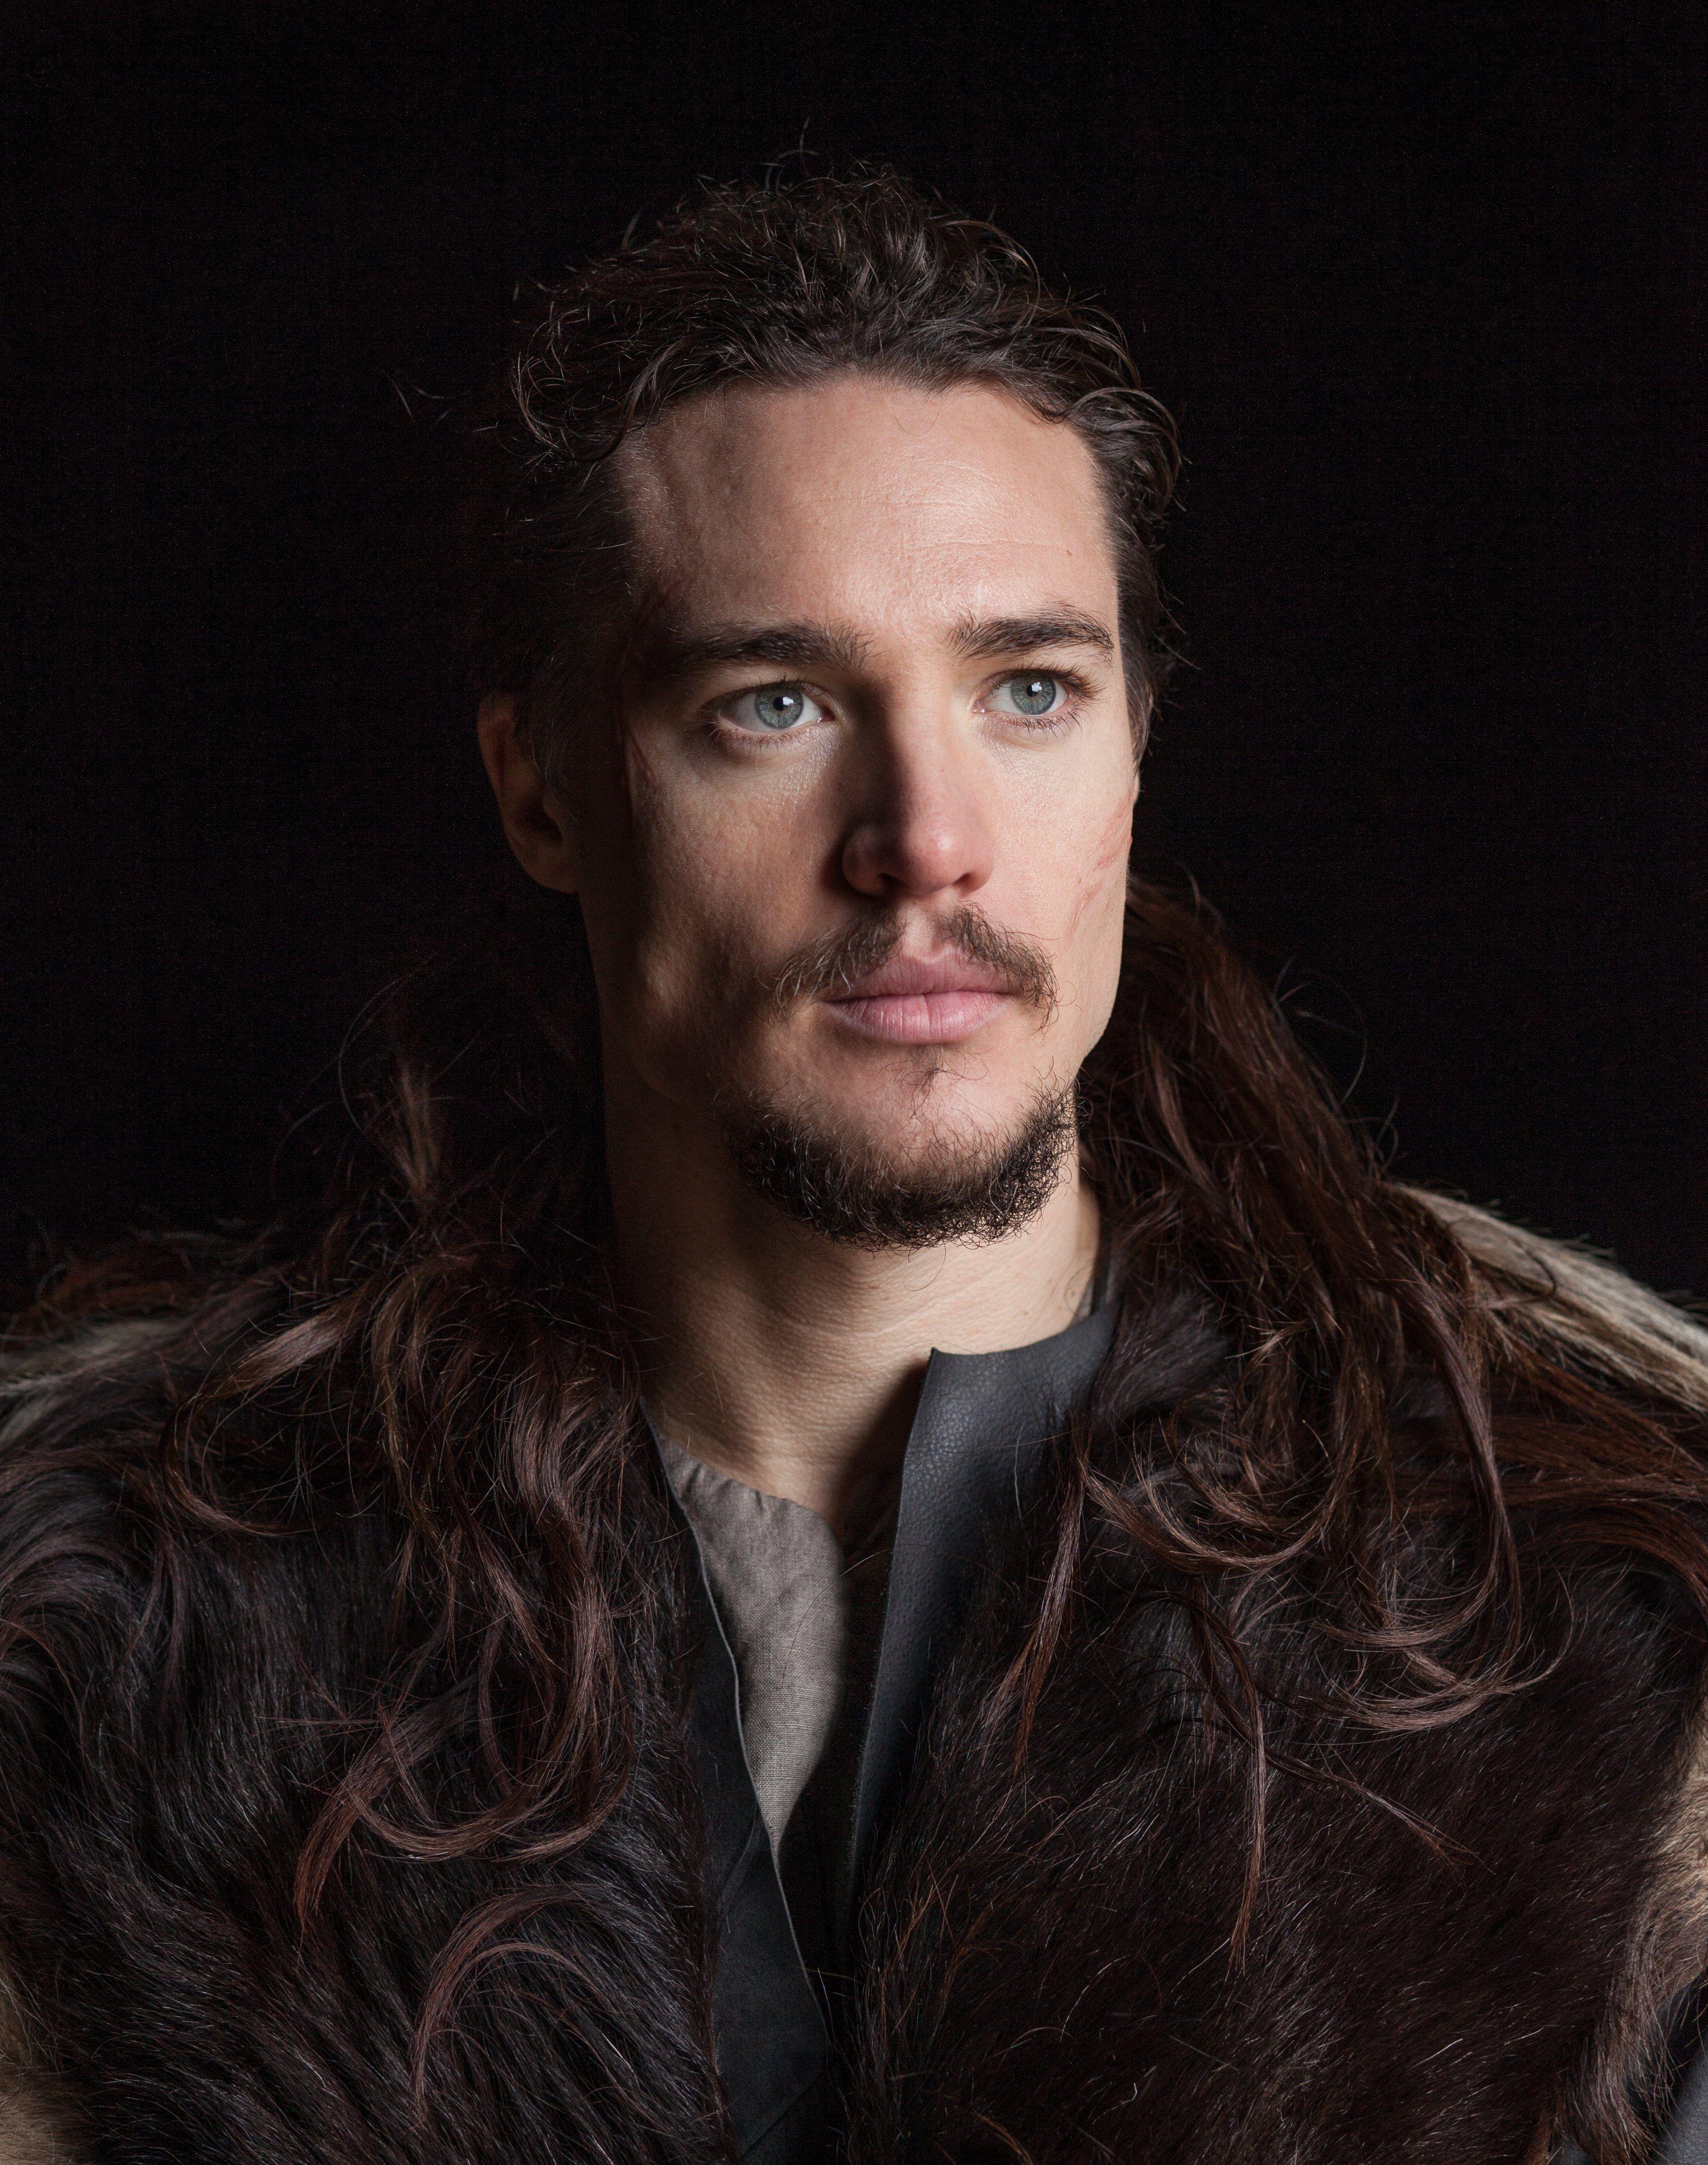 "Alexander Dreymon as Uhtred of Bebbanburg in ""The Last Kingdom"" Season 1 From http://www.farfarawaysite.com/section/lastkingdom/gallery1/gallery2/gallery.htm"